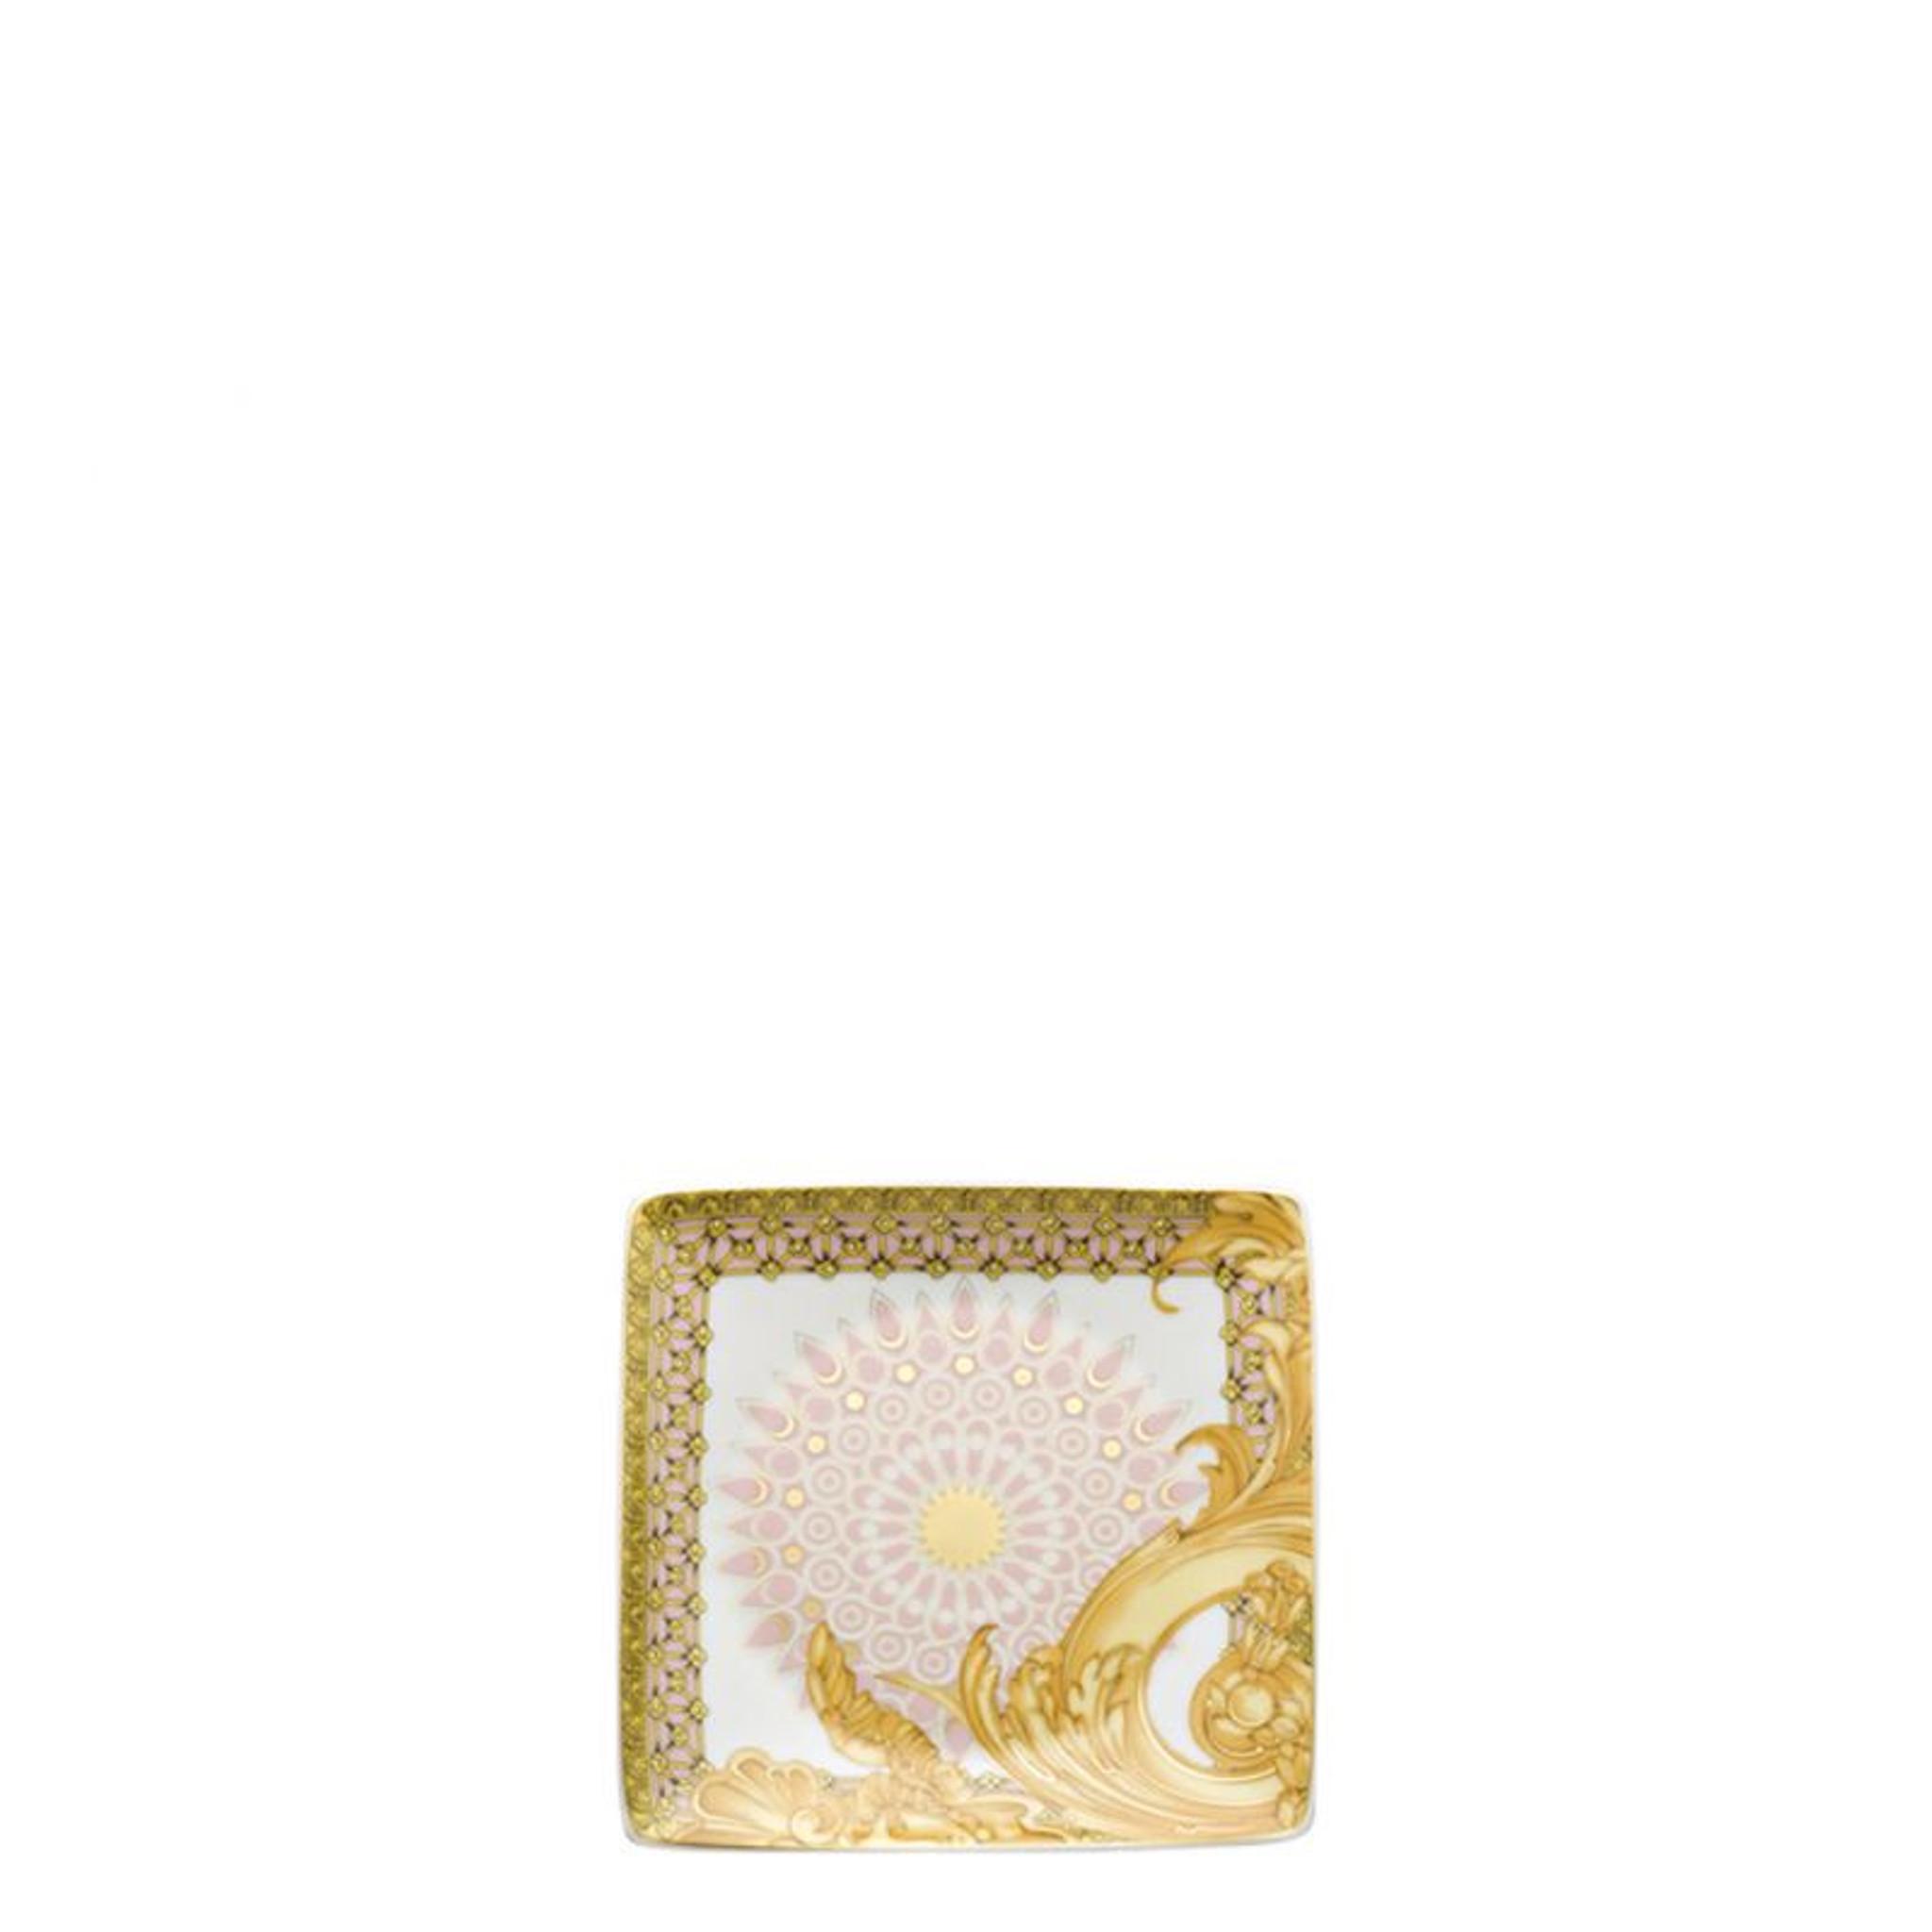 Versace byzantine dreams canape dish porcelain 4 3 4 inch - Canape versace ...